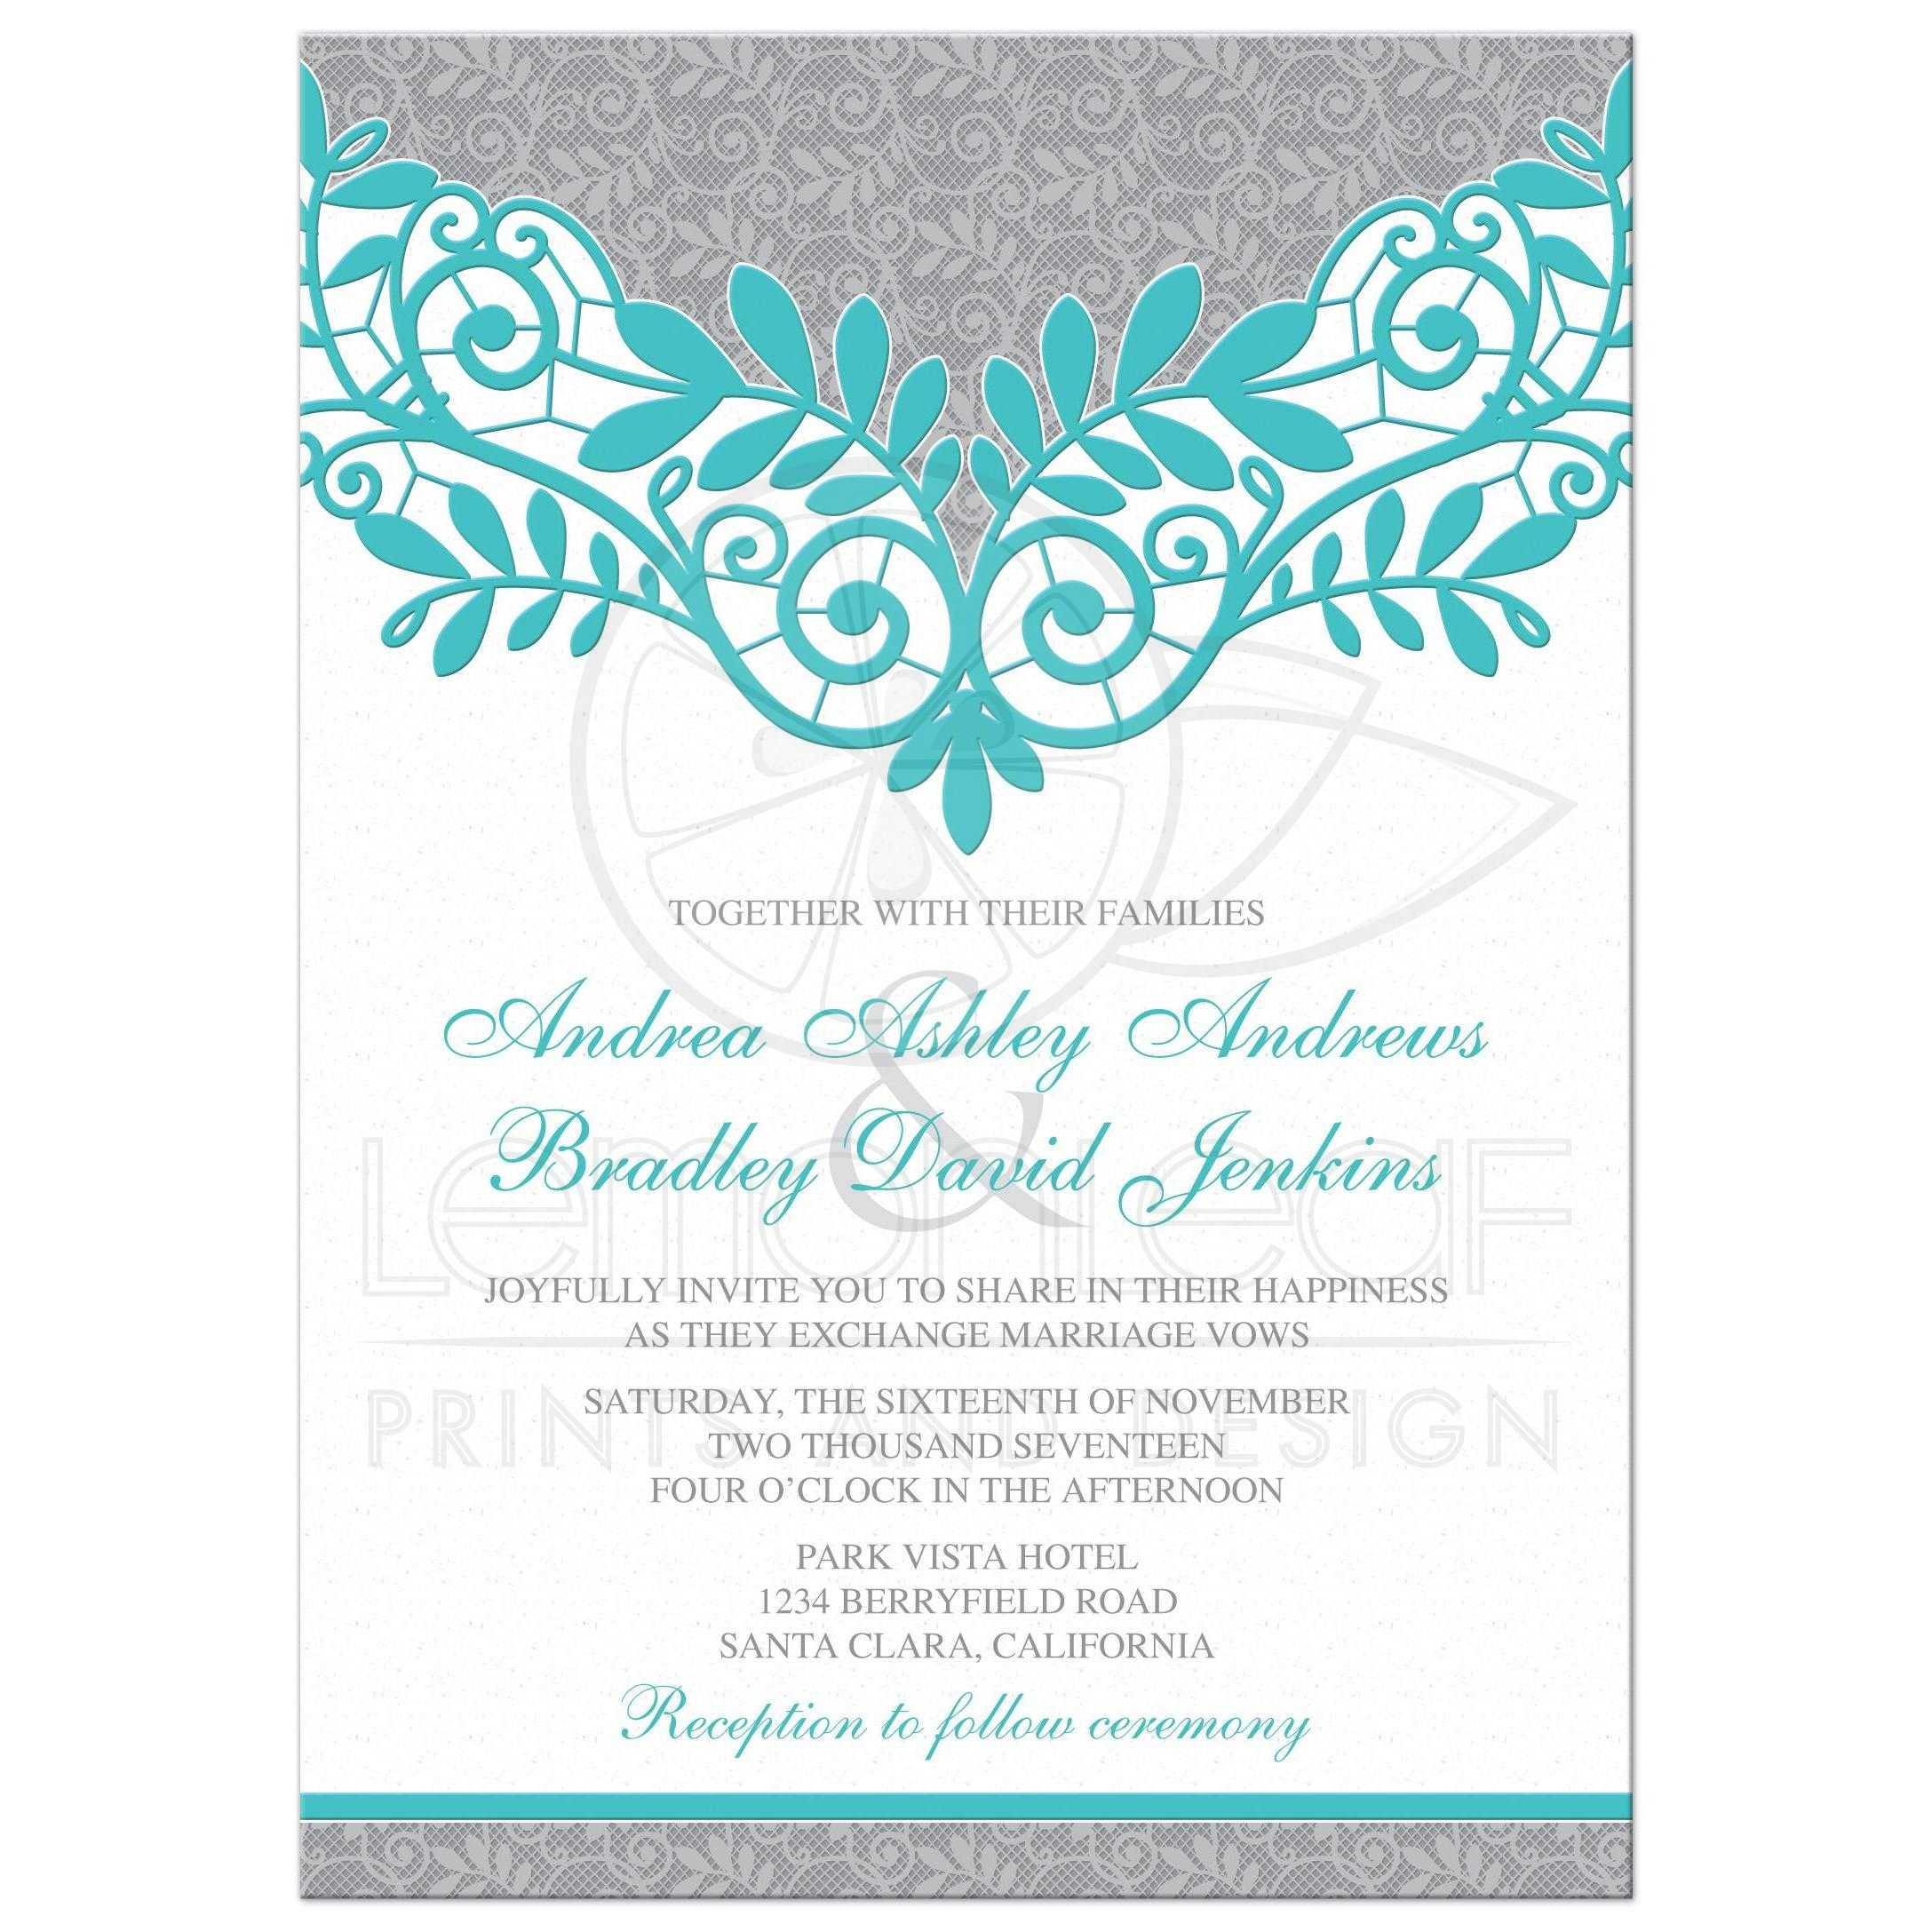 Elegant Turquoise And Silver Grey Lace Wedding Invitation ...